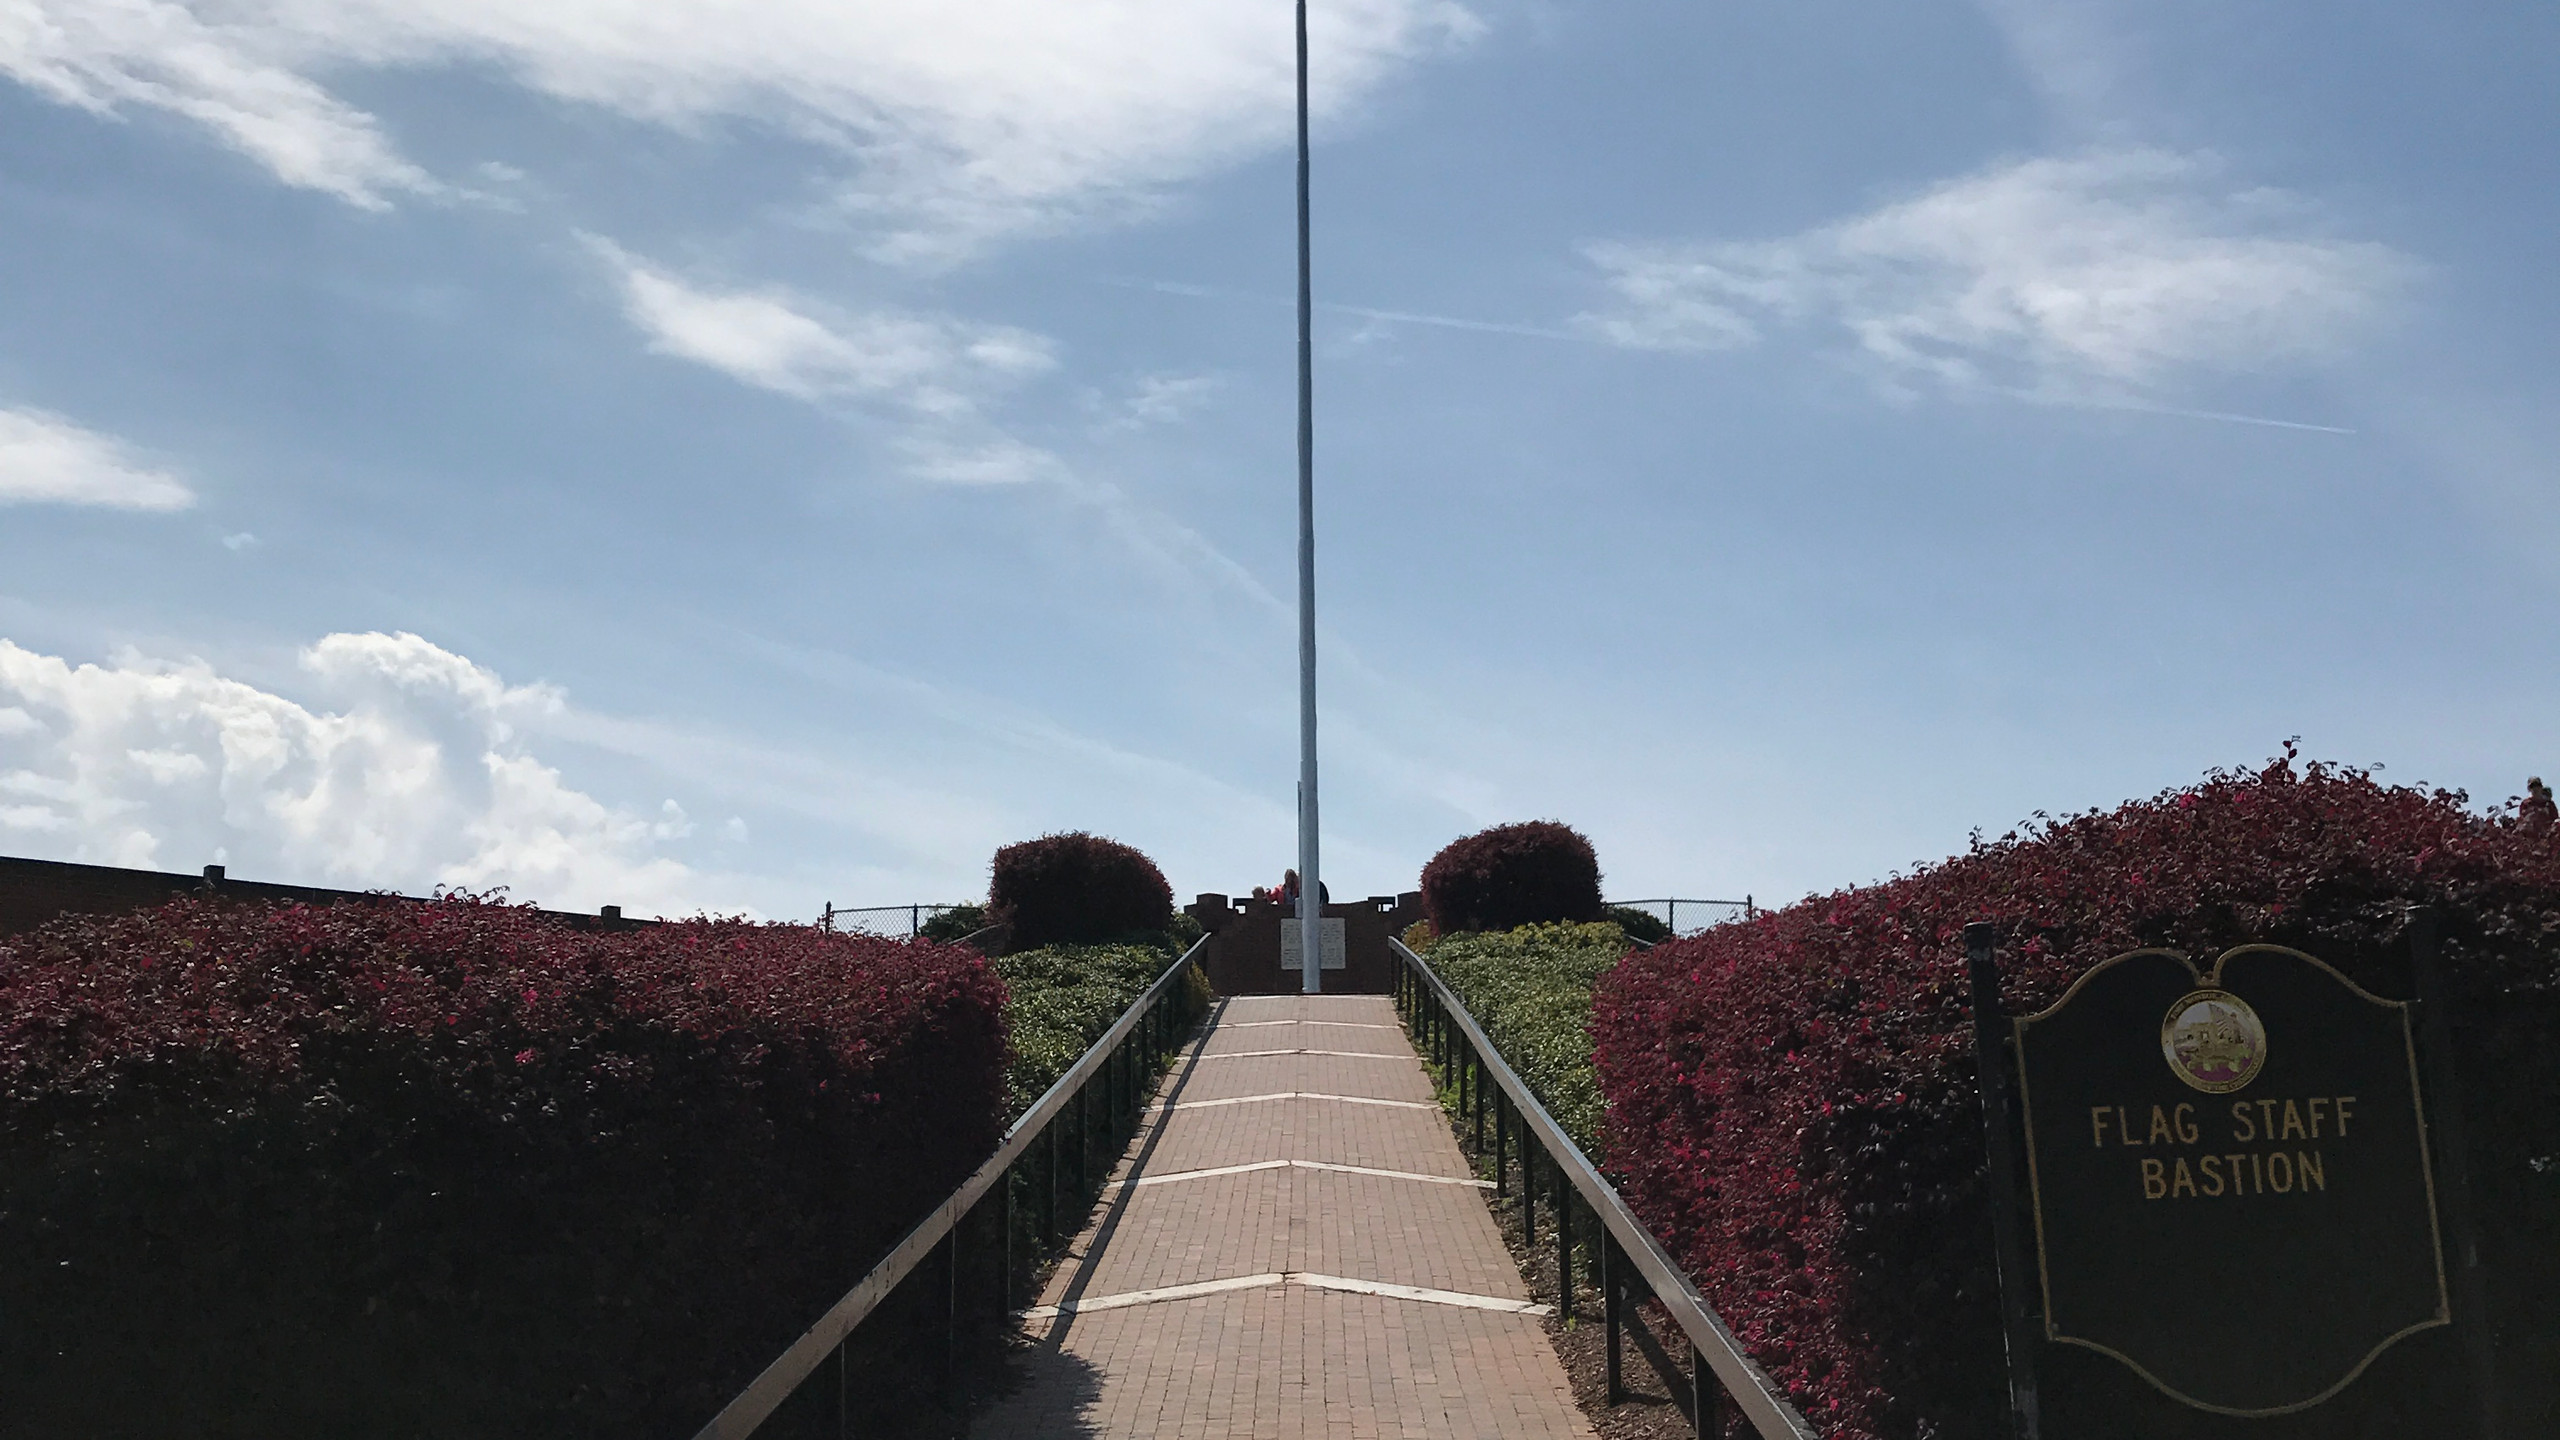 Flag Staff Bastion